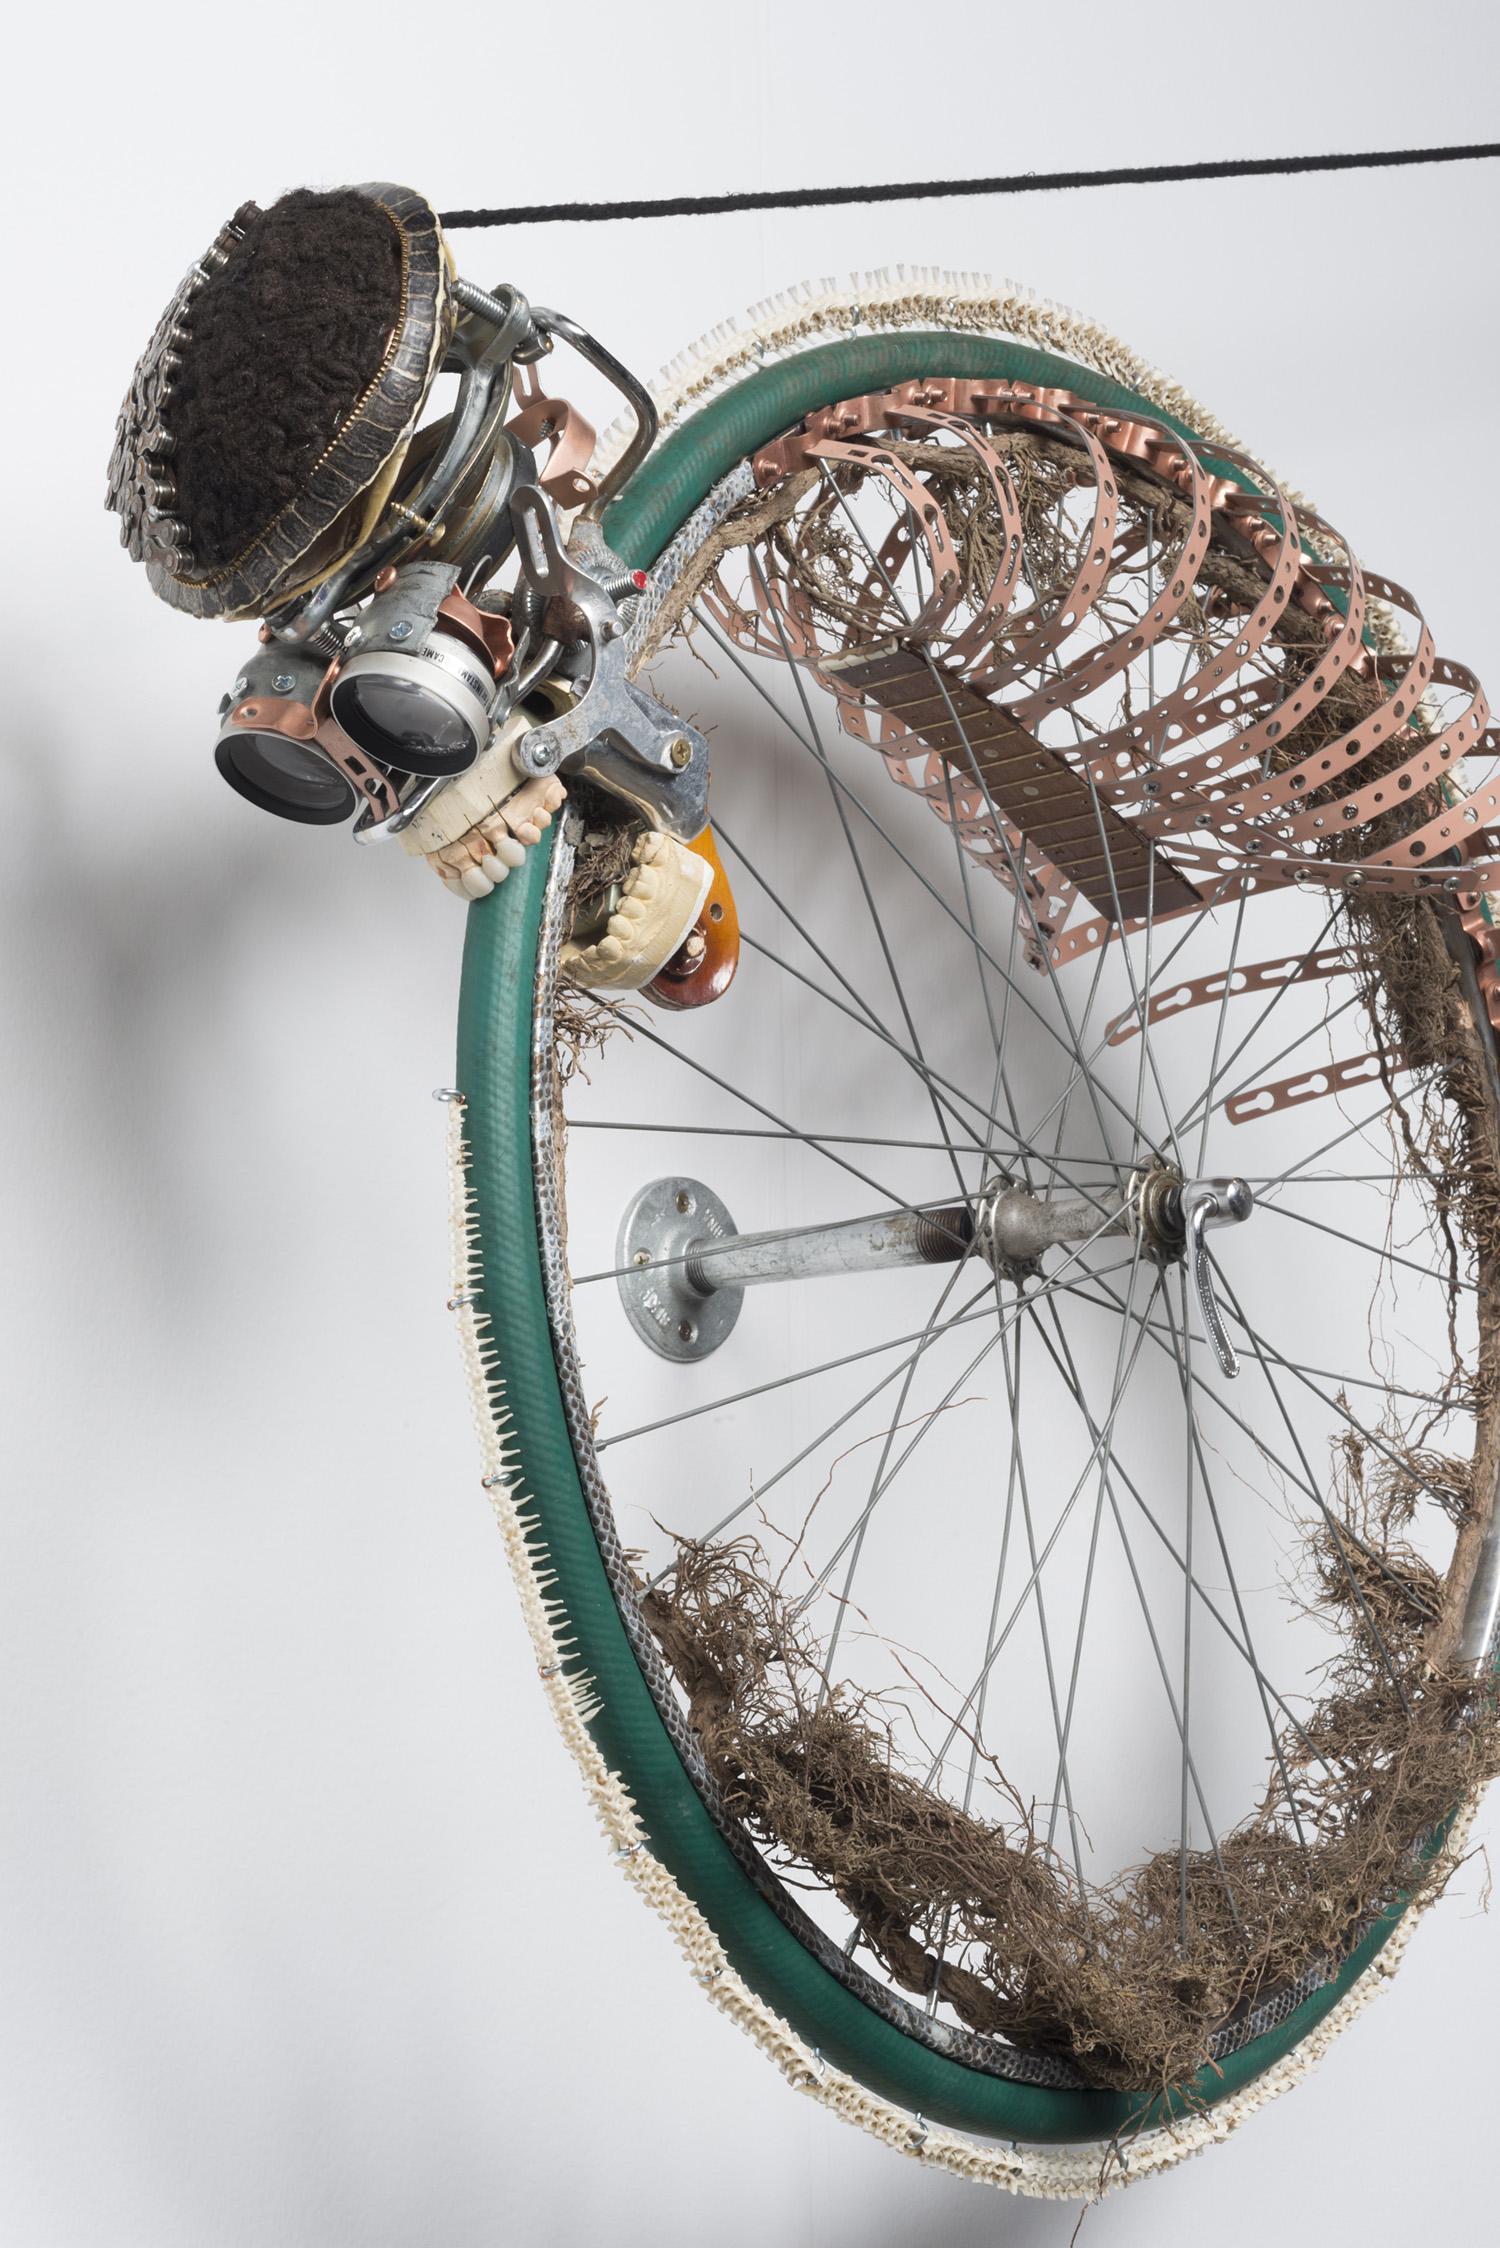 Lorna Williams-Ouroboros-2013-hair, plumbing hardware, violin parts, photography lenses, snake vertebrae, bike wheel, hose, ukulele neck, bike chain, plaster teeth, bike seat, speaker, snake shedding, root, rope, cement-88x60x13-detail-1.jpg